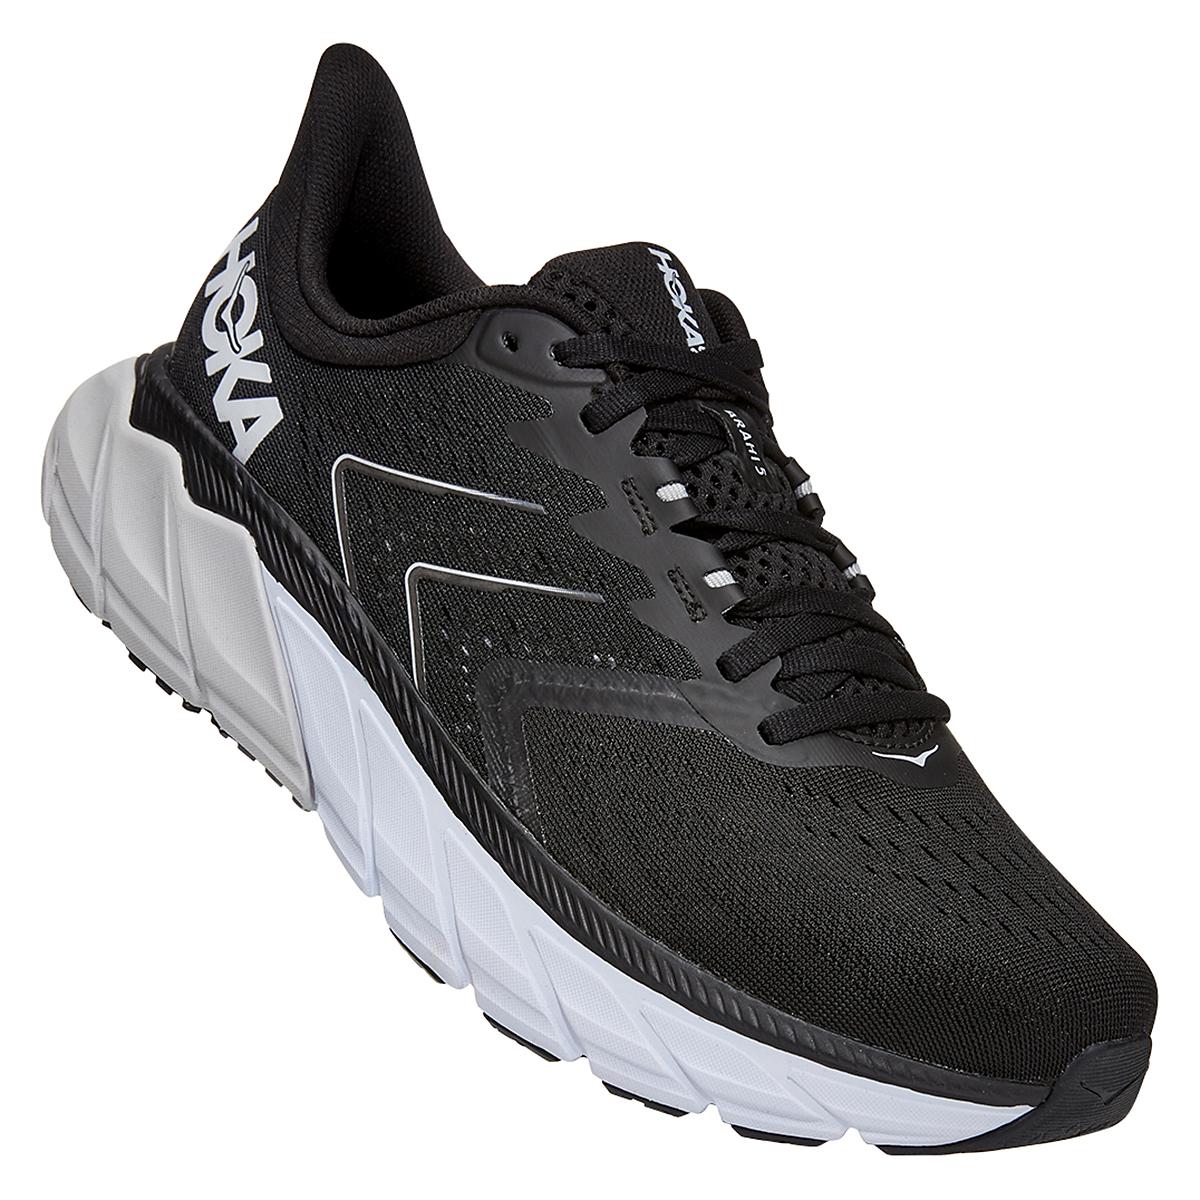 Men's Hoka One One Arahi 5 Running Shoe - Color: Black/White - Size: 7 - Width: Regular, Black/White, large, image 2